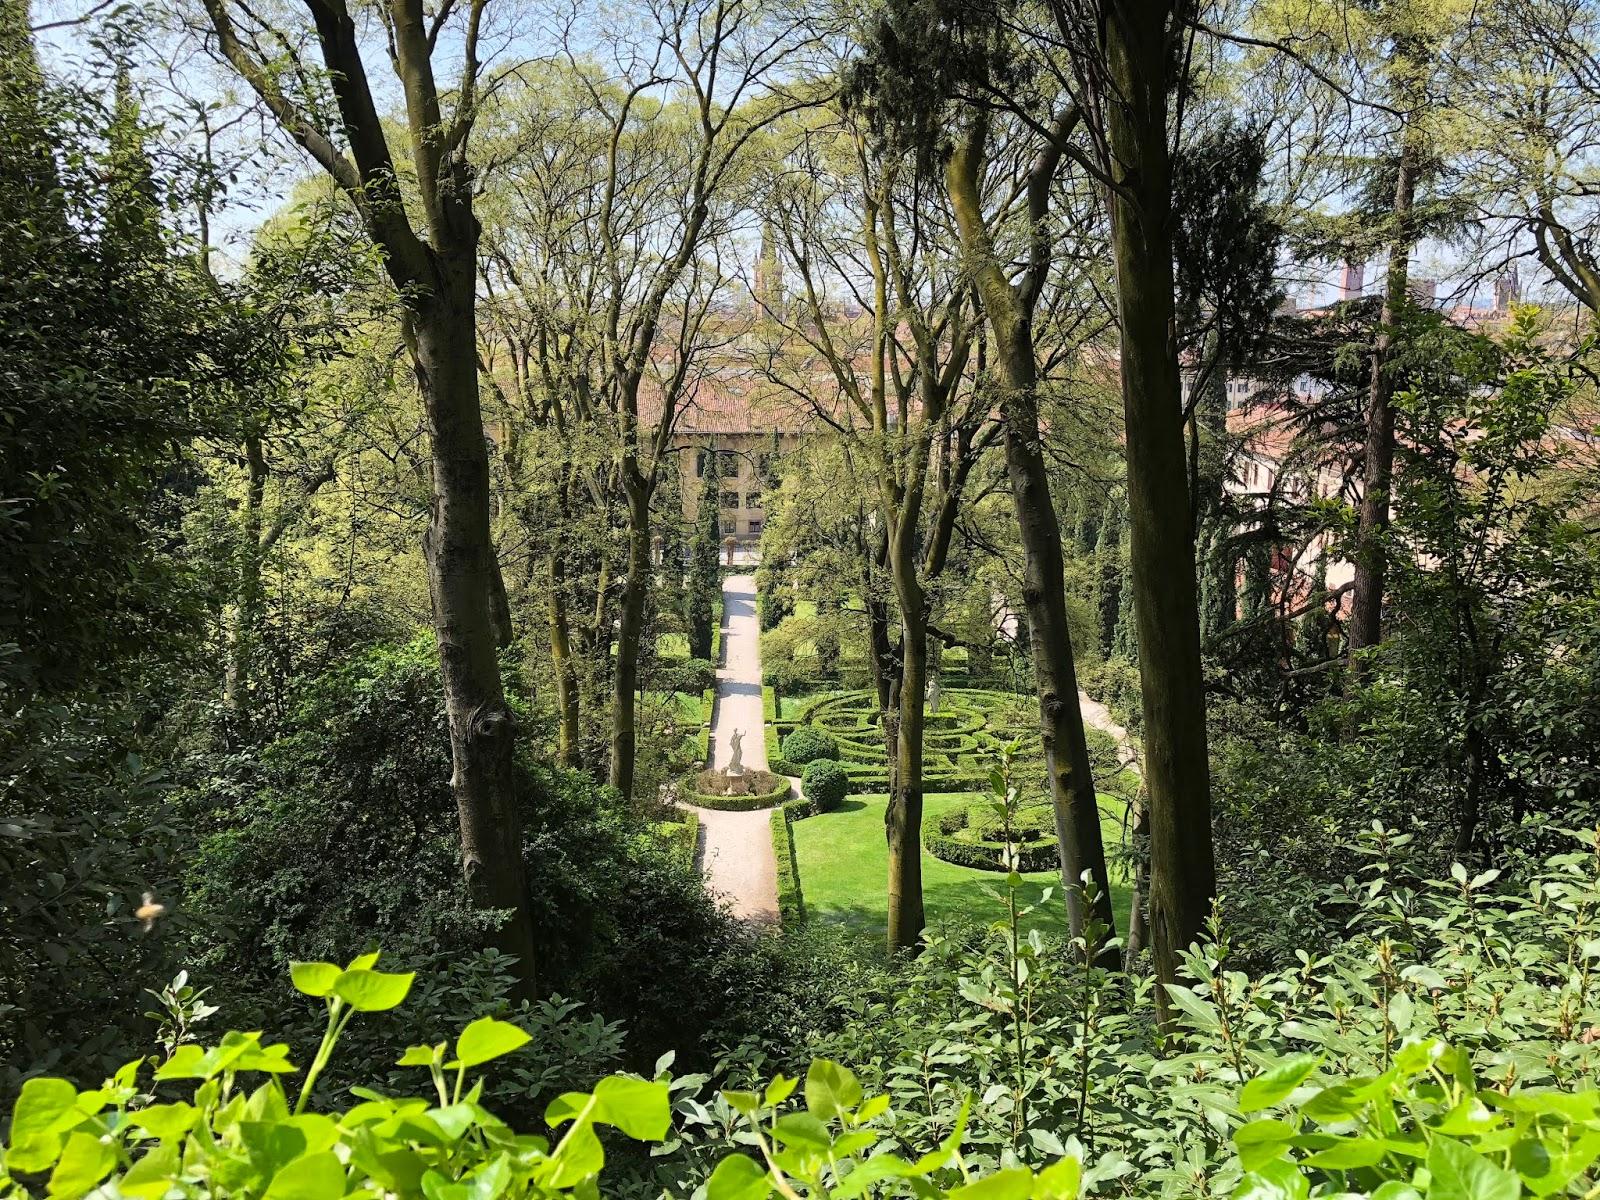 сады Джусти Изображение palazzo giardino giusti Верона